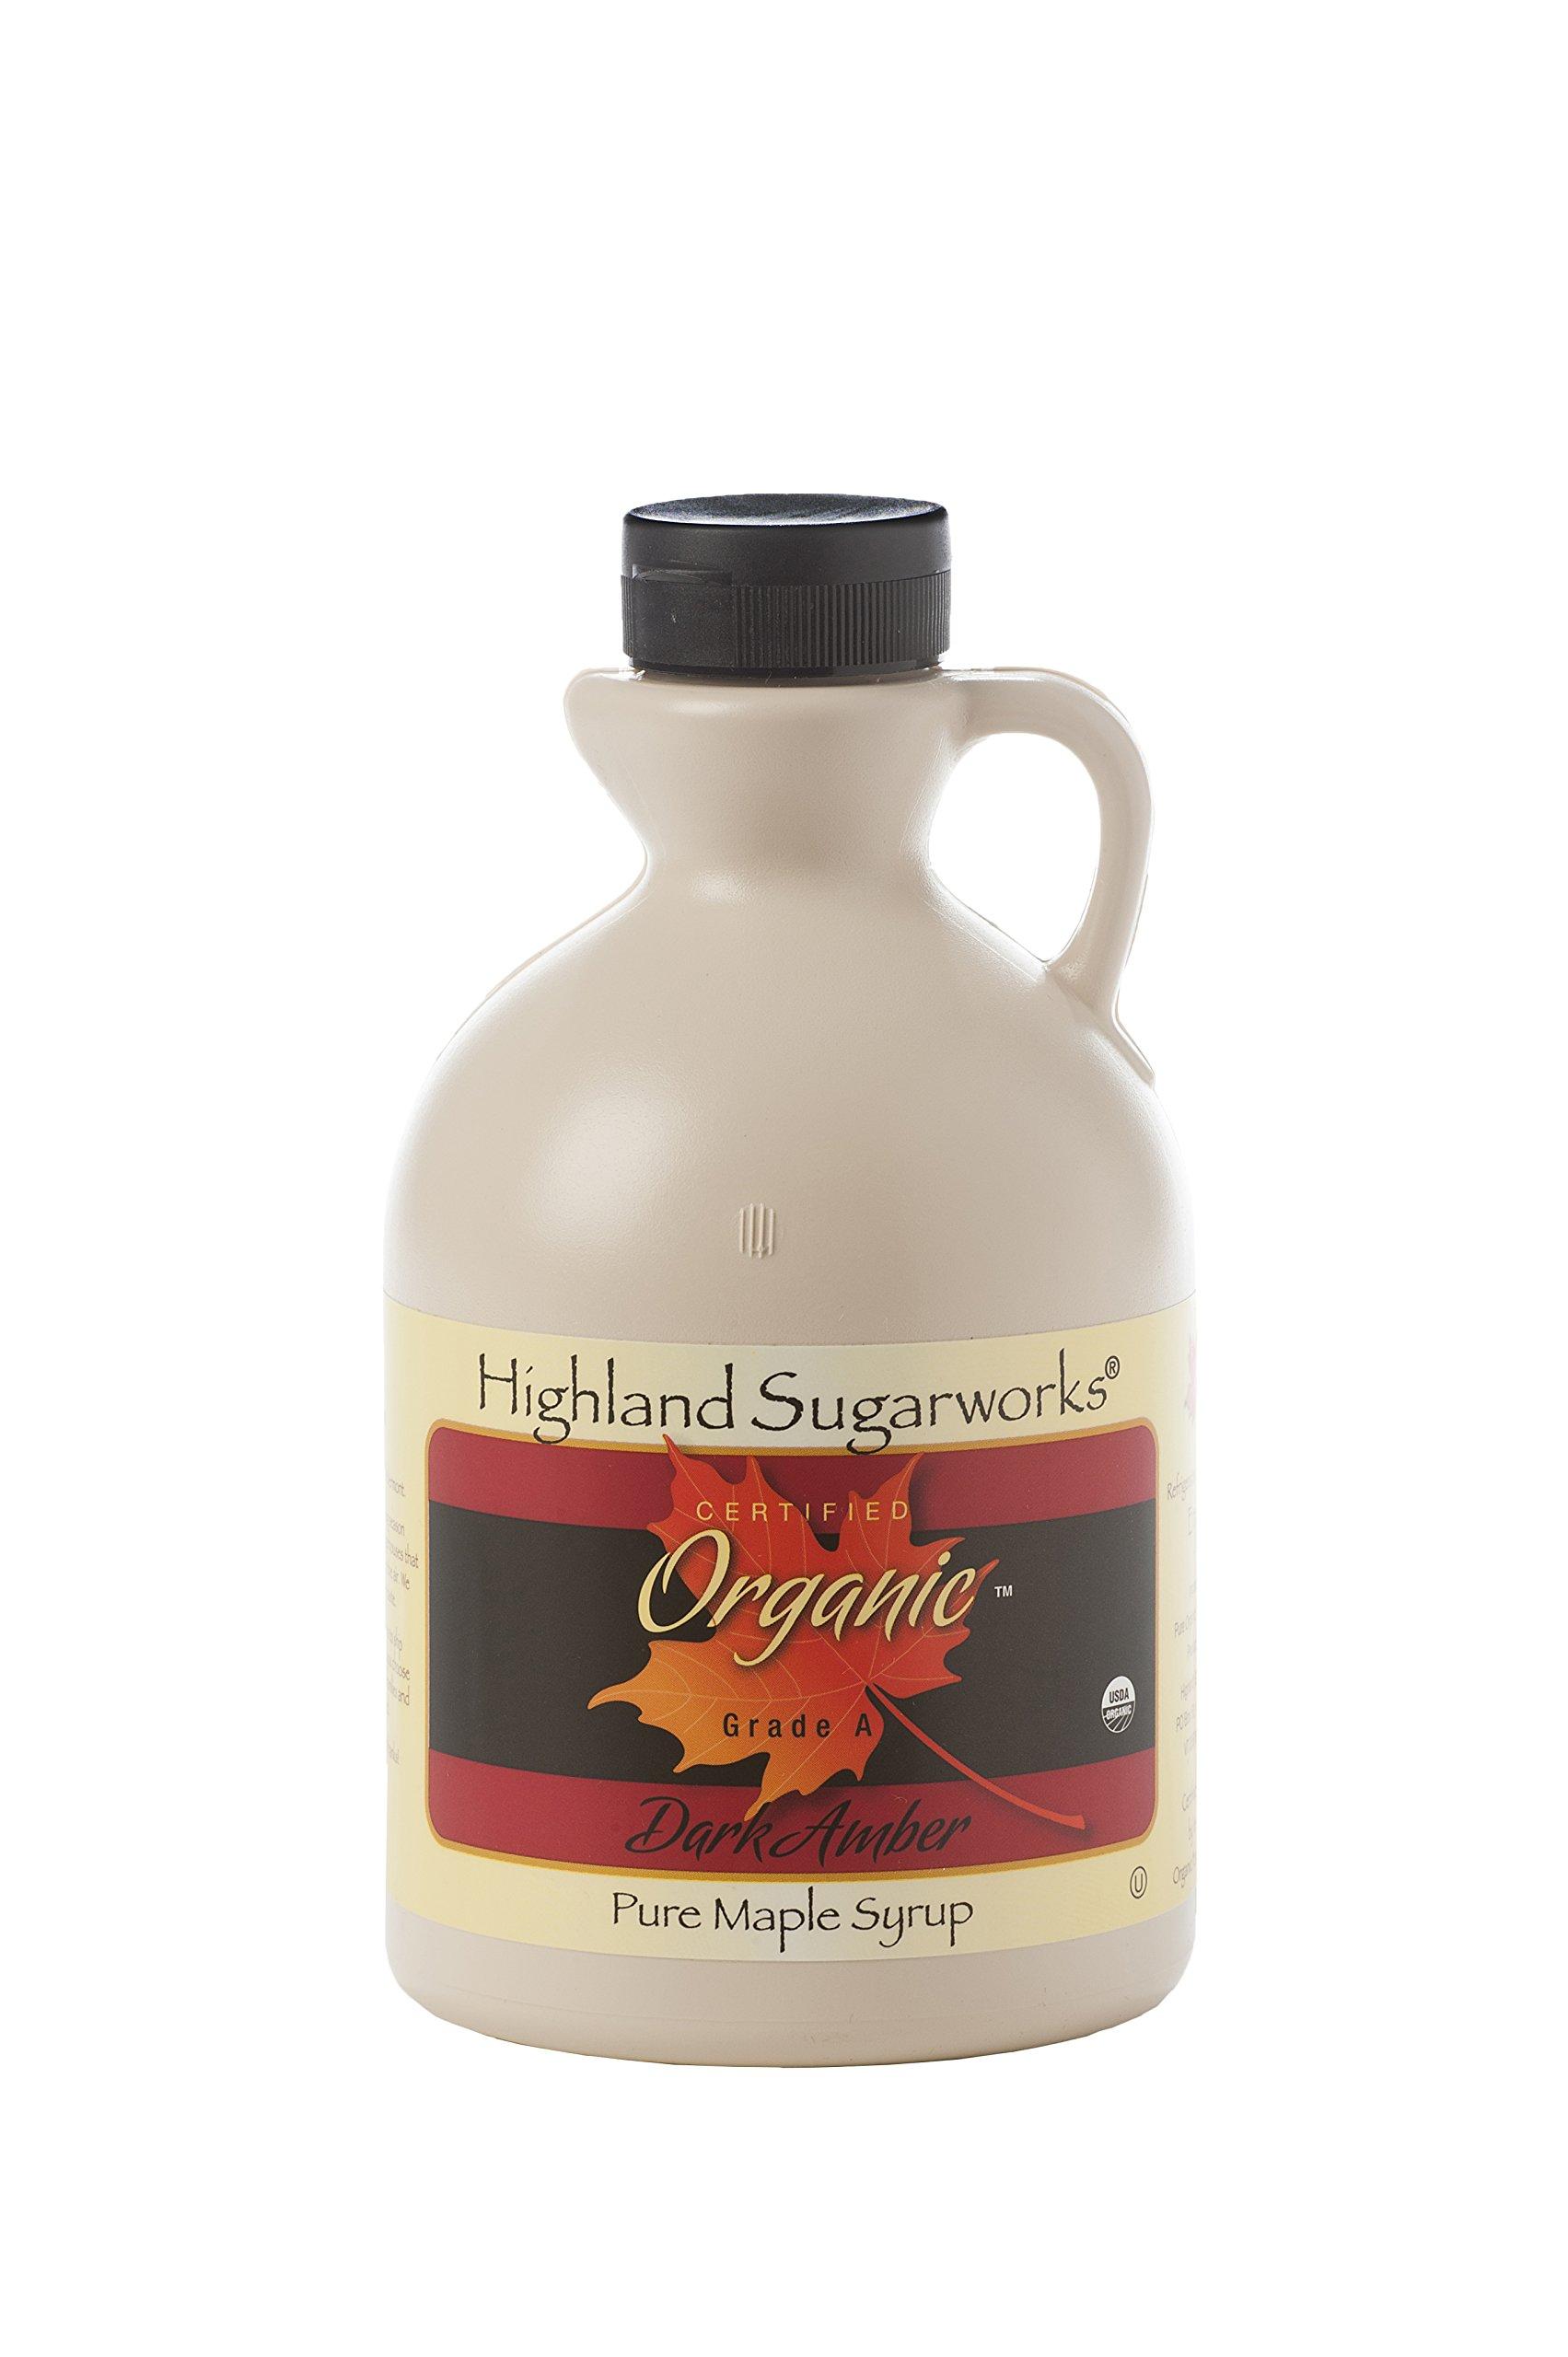 Highland Sugarworks Jug 100% Maple Syrup Pure Grade A Organic Dark with Robust Taste 32oz.